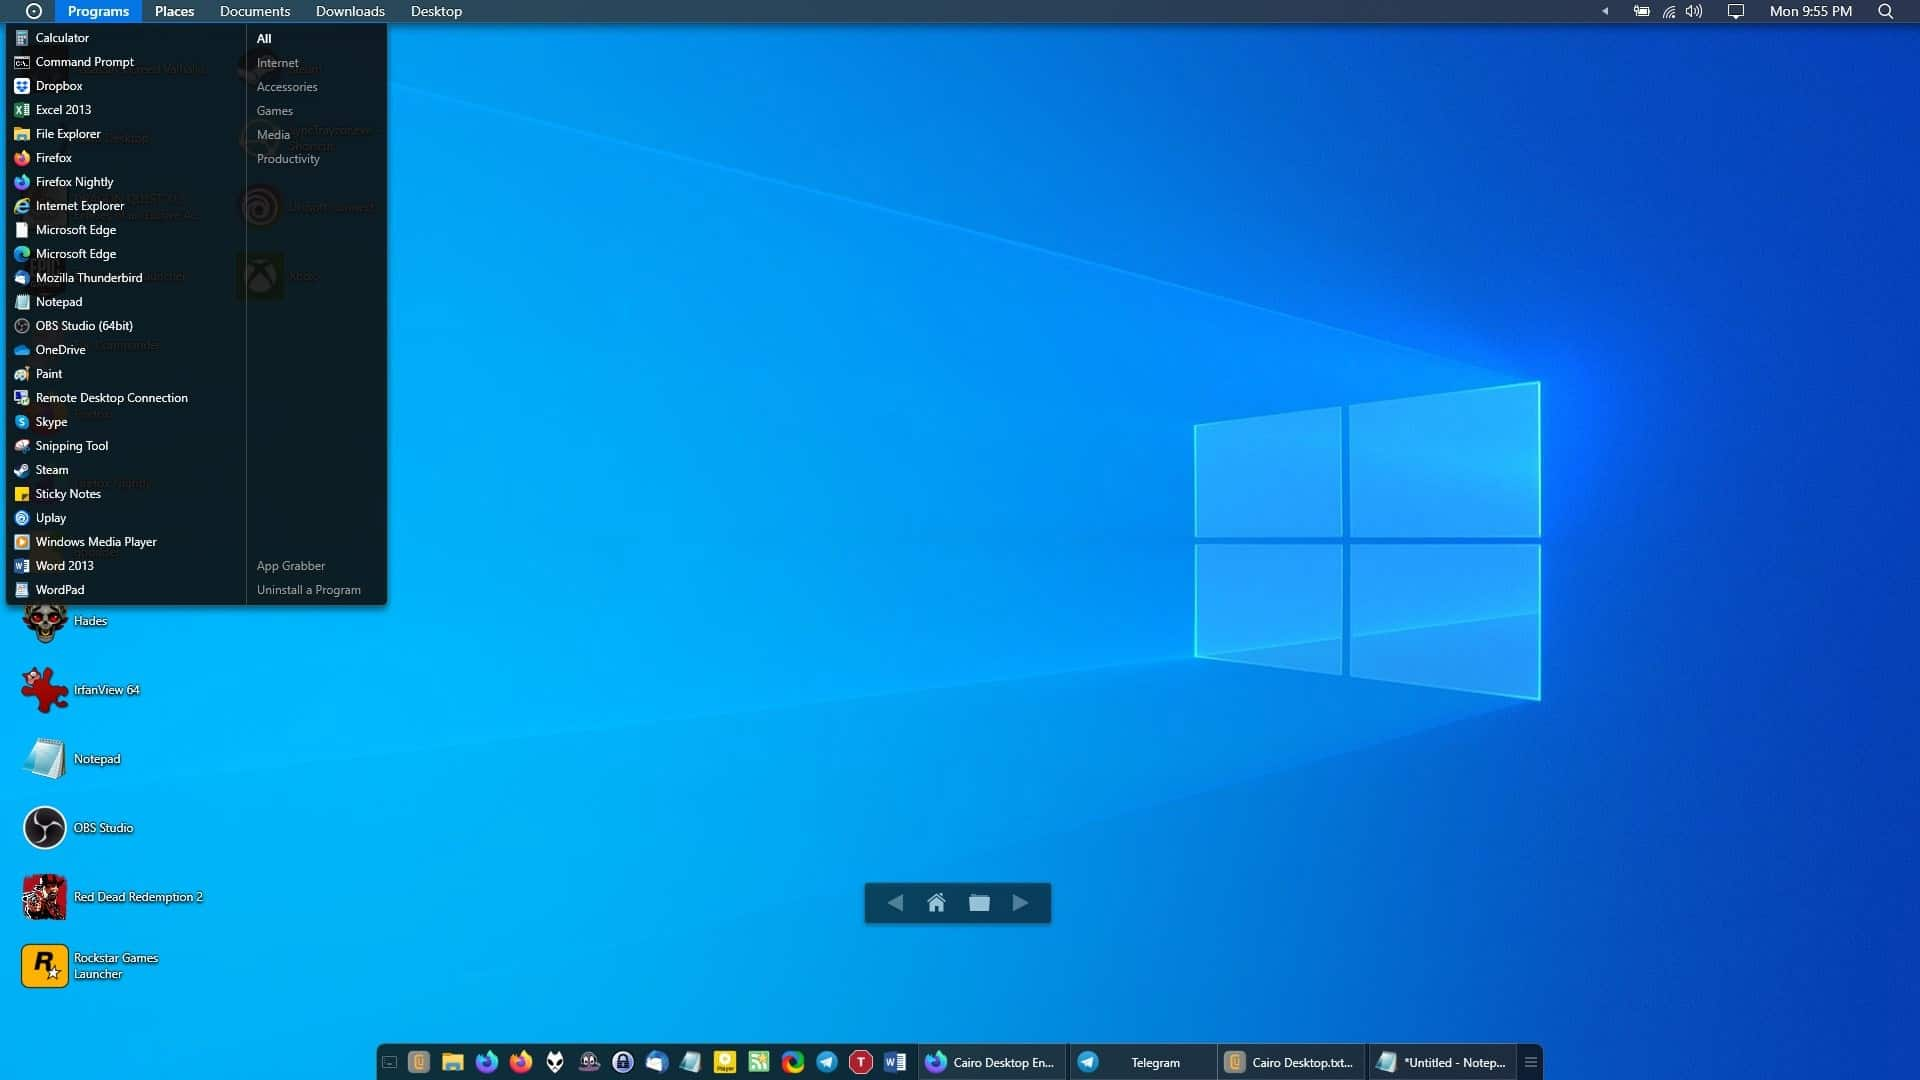 Cairo Desktop programs menu